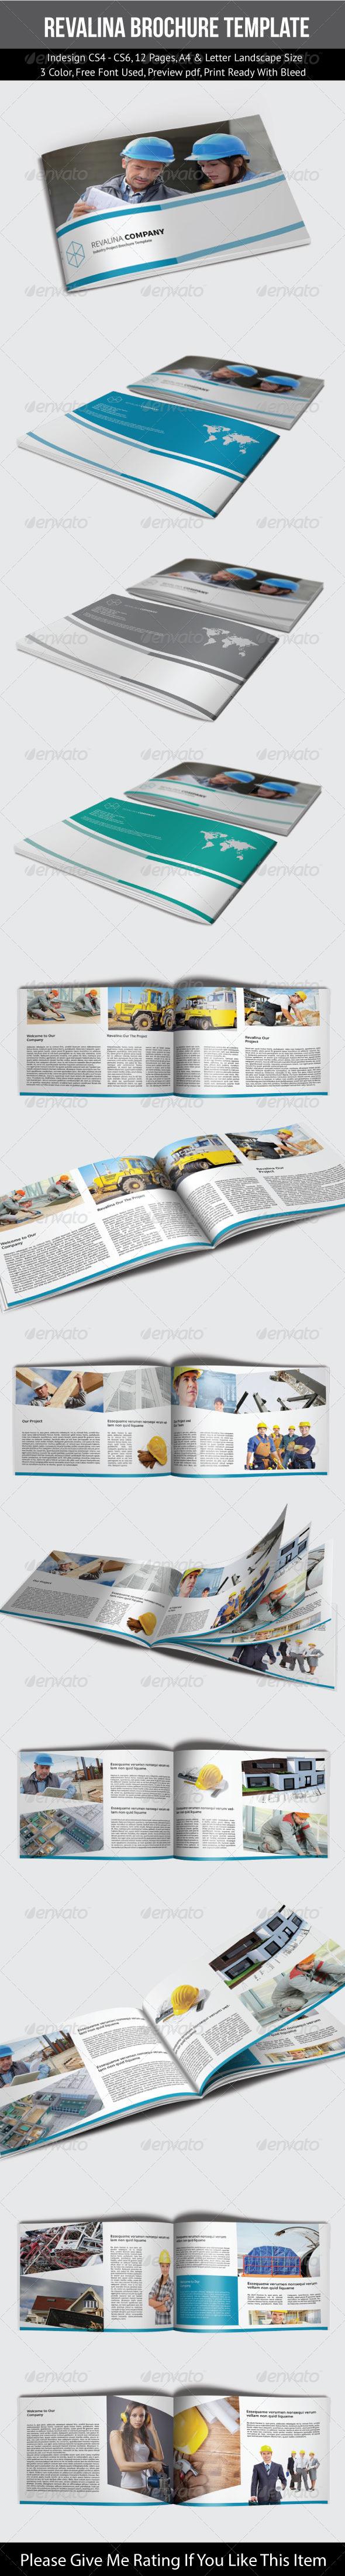 Revalina Corporate Brochure Template - Corporate Brochures